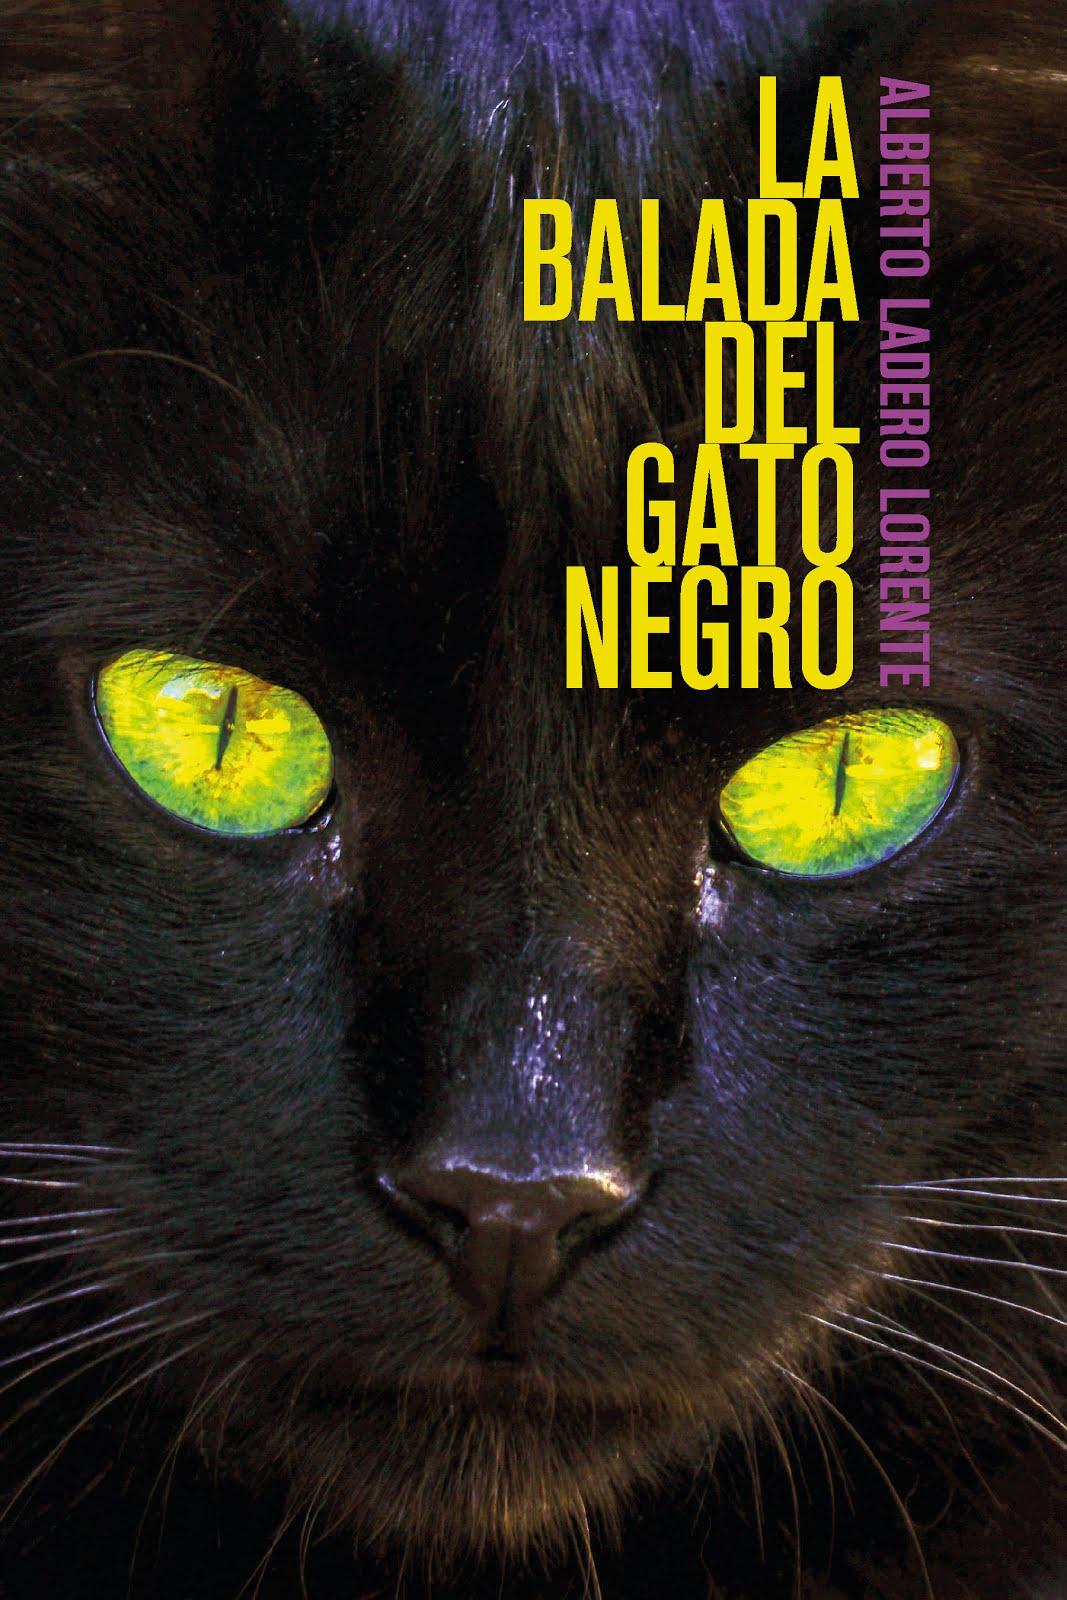 La Balada del Gato Negro